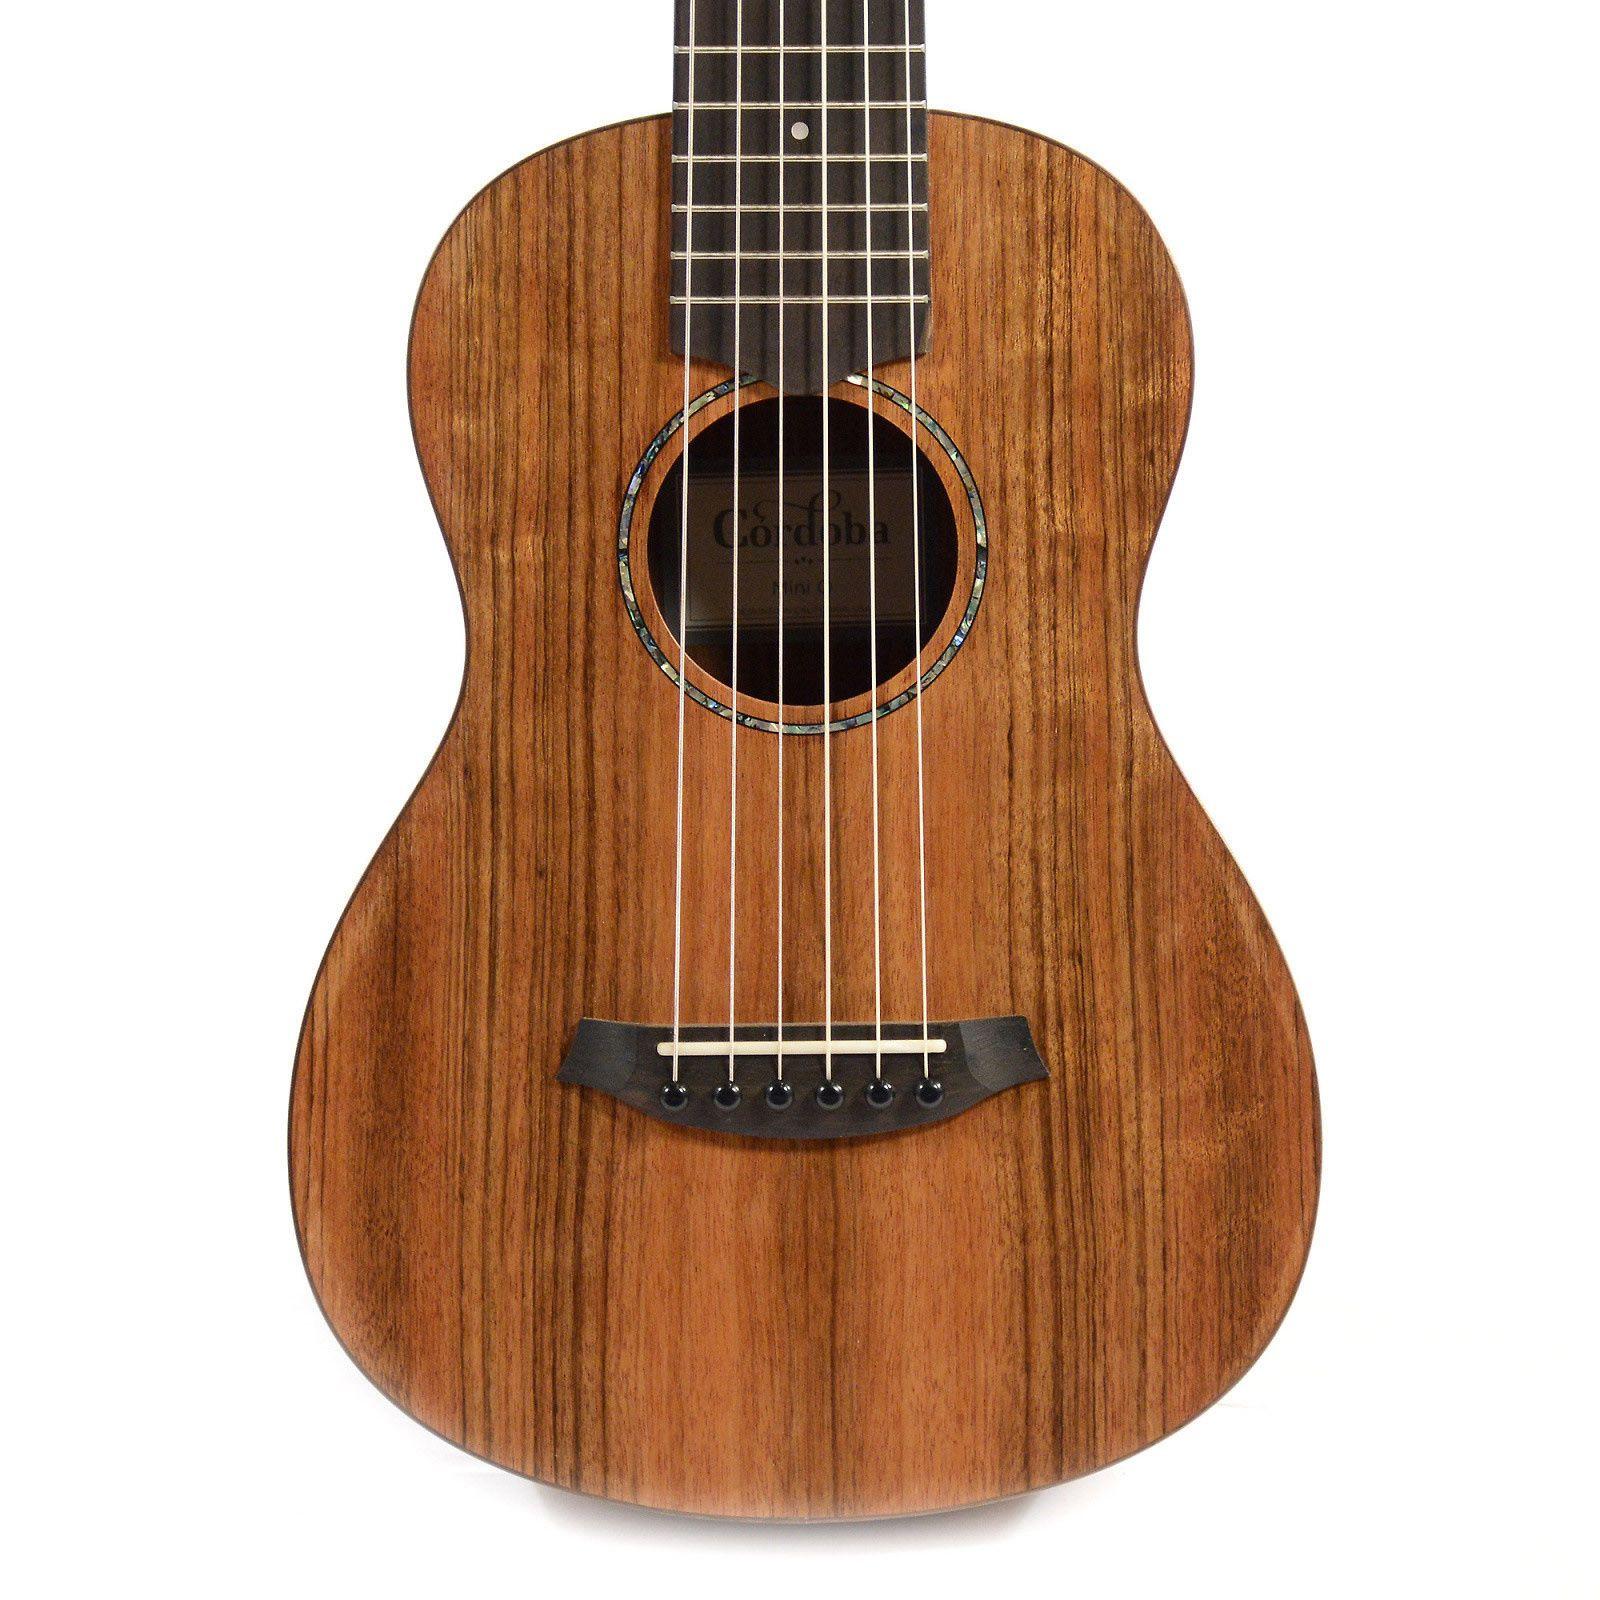 Cordoba mini o nylon string acoustic guitar solid ovagkol